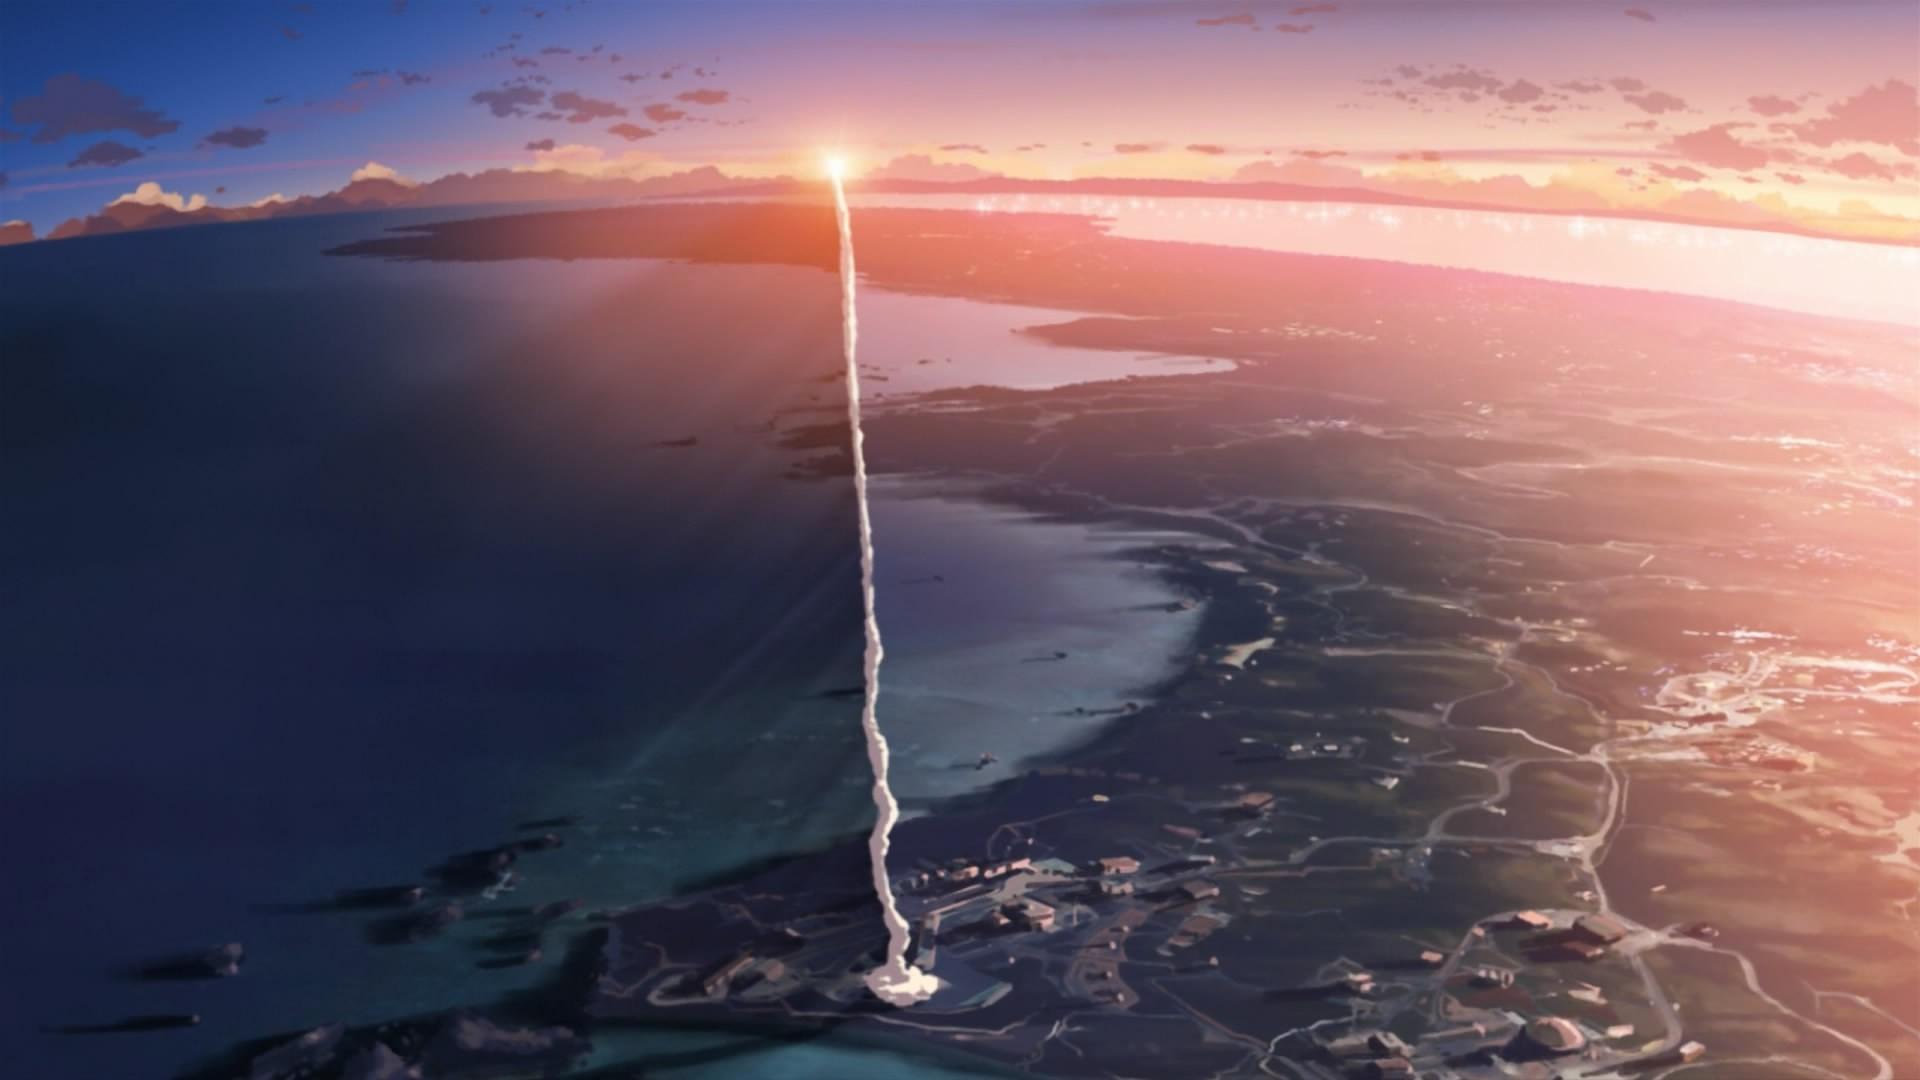 Wallpaper Japan Sunset Sea Anime Sky Smoke Movies Earth Sunrise Calm Coast Horizon 5 Centimeters Per Second Makoto Shinkai Contrails Screengrab Dawn Ocean Wave 1920x1080 Px Rockets Atmosphere Of Earth Aerial